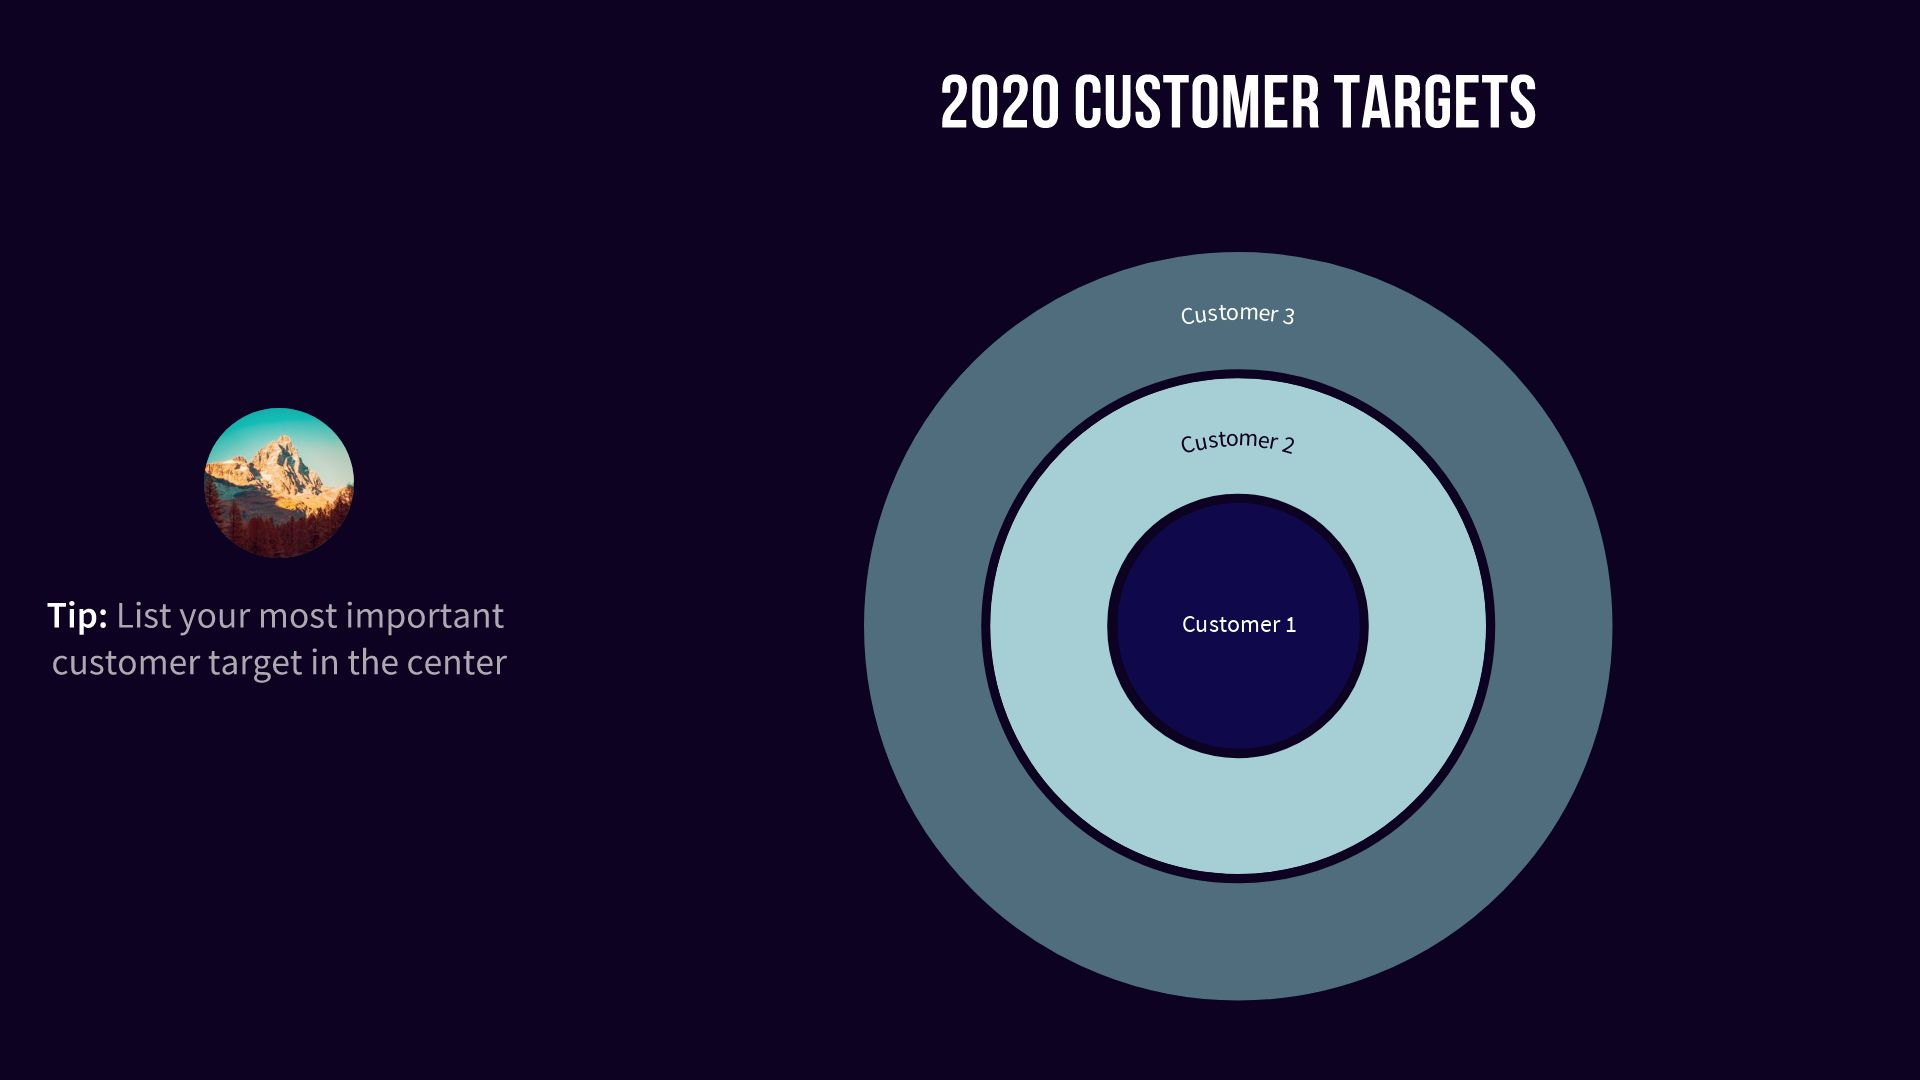 Customer Targets